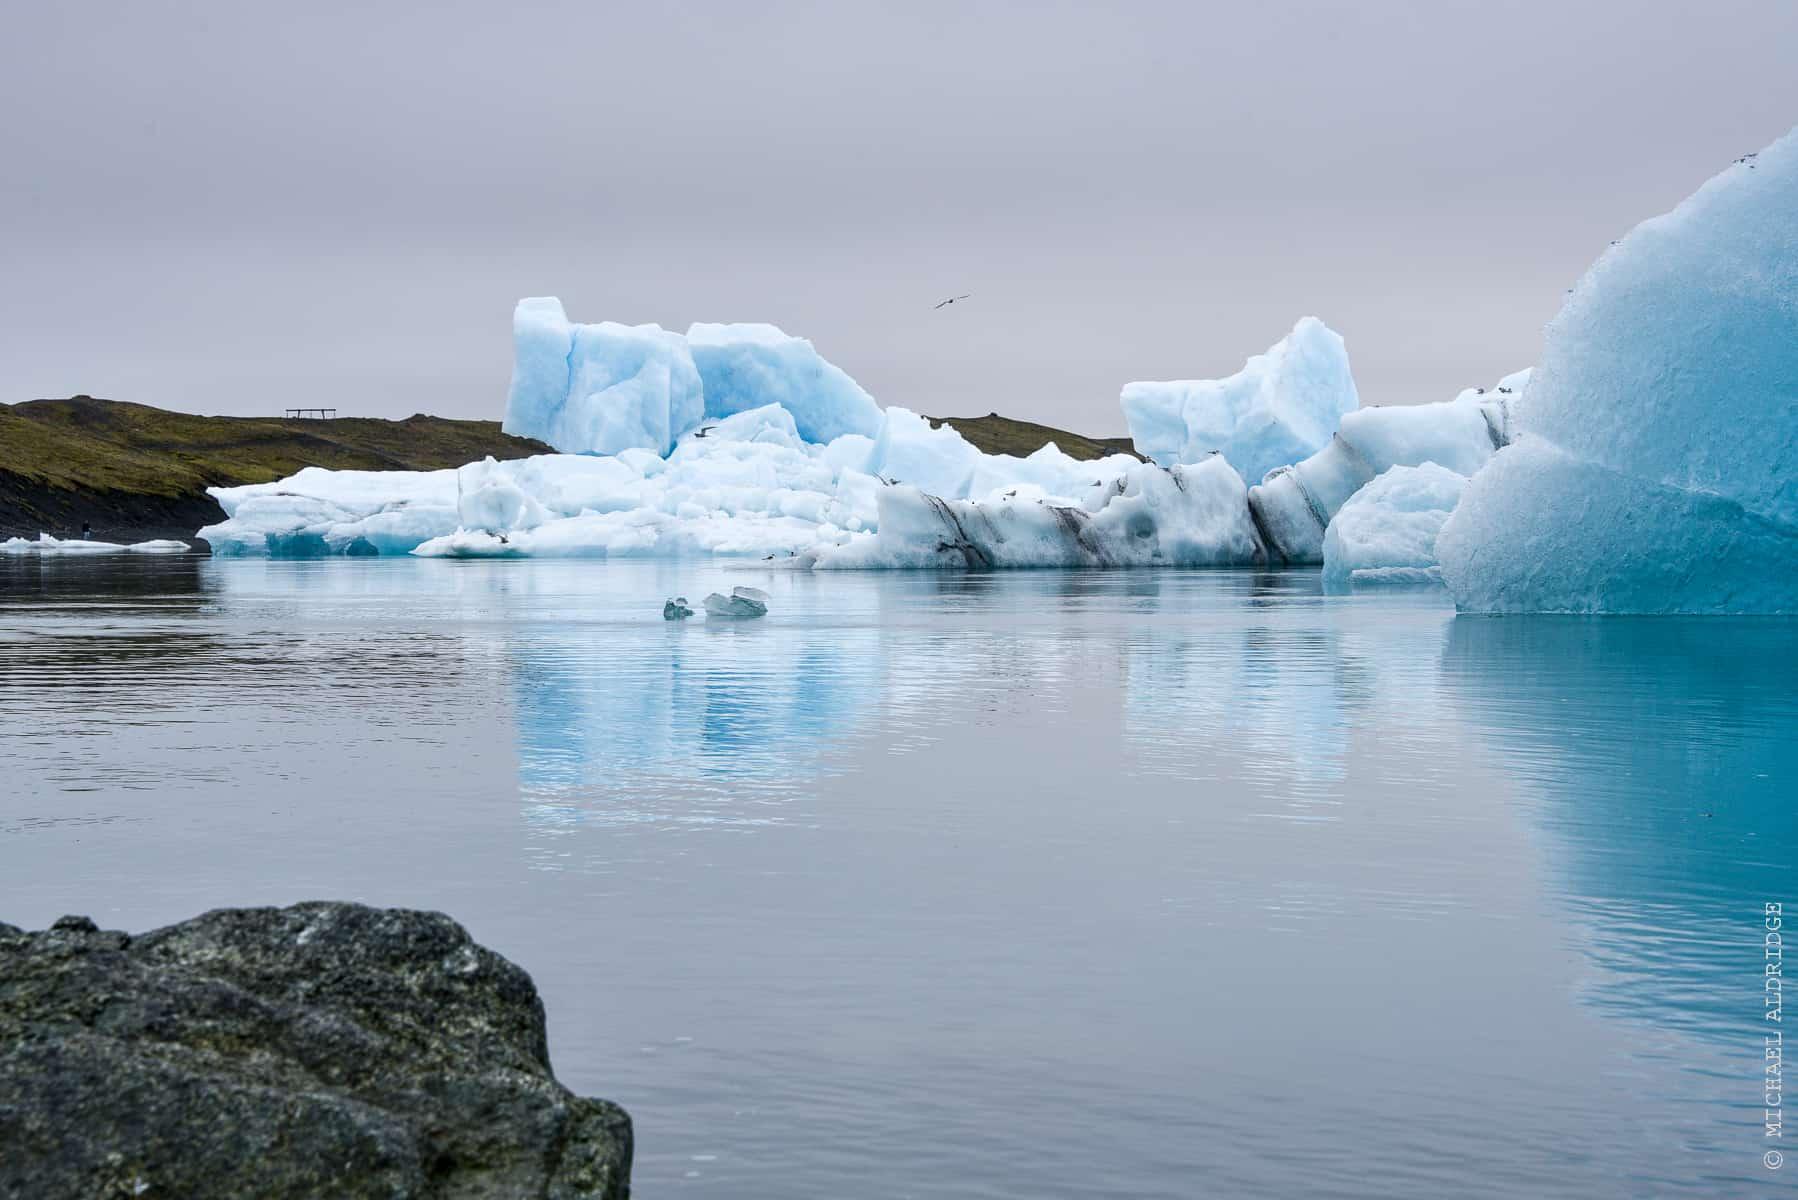 Jökulsárlón Iceberg Lagoon, Iceland